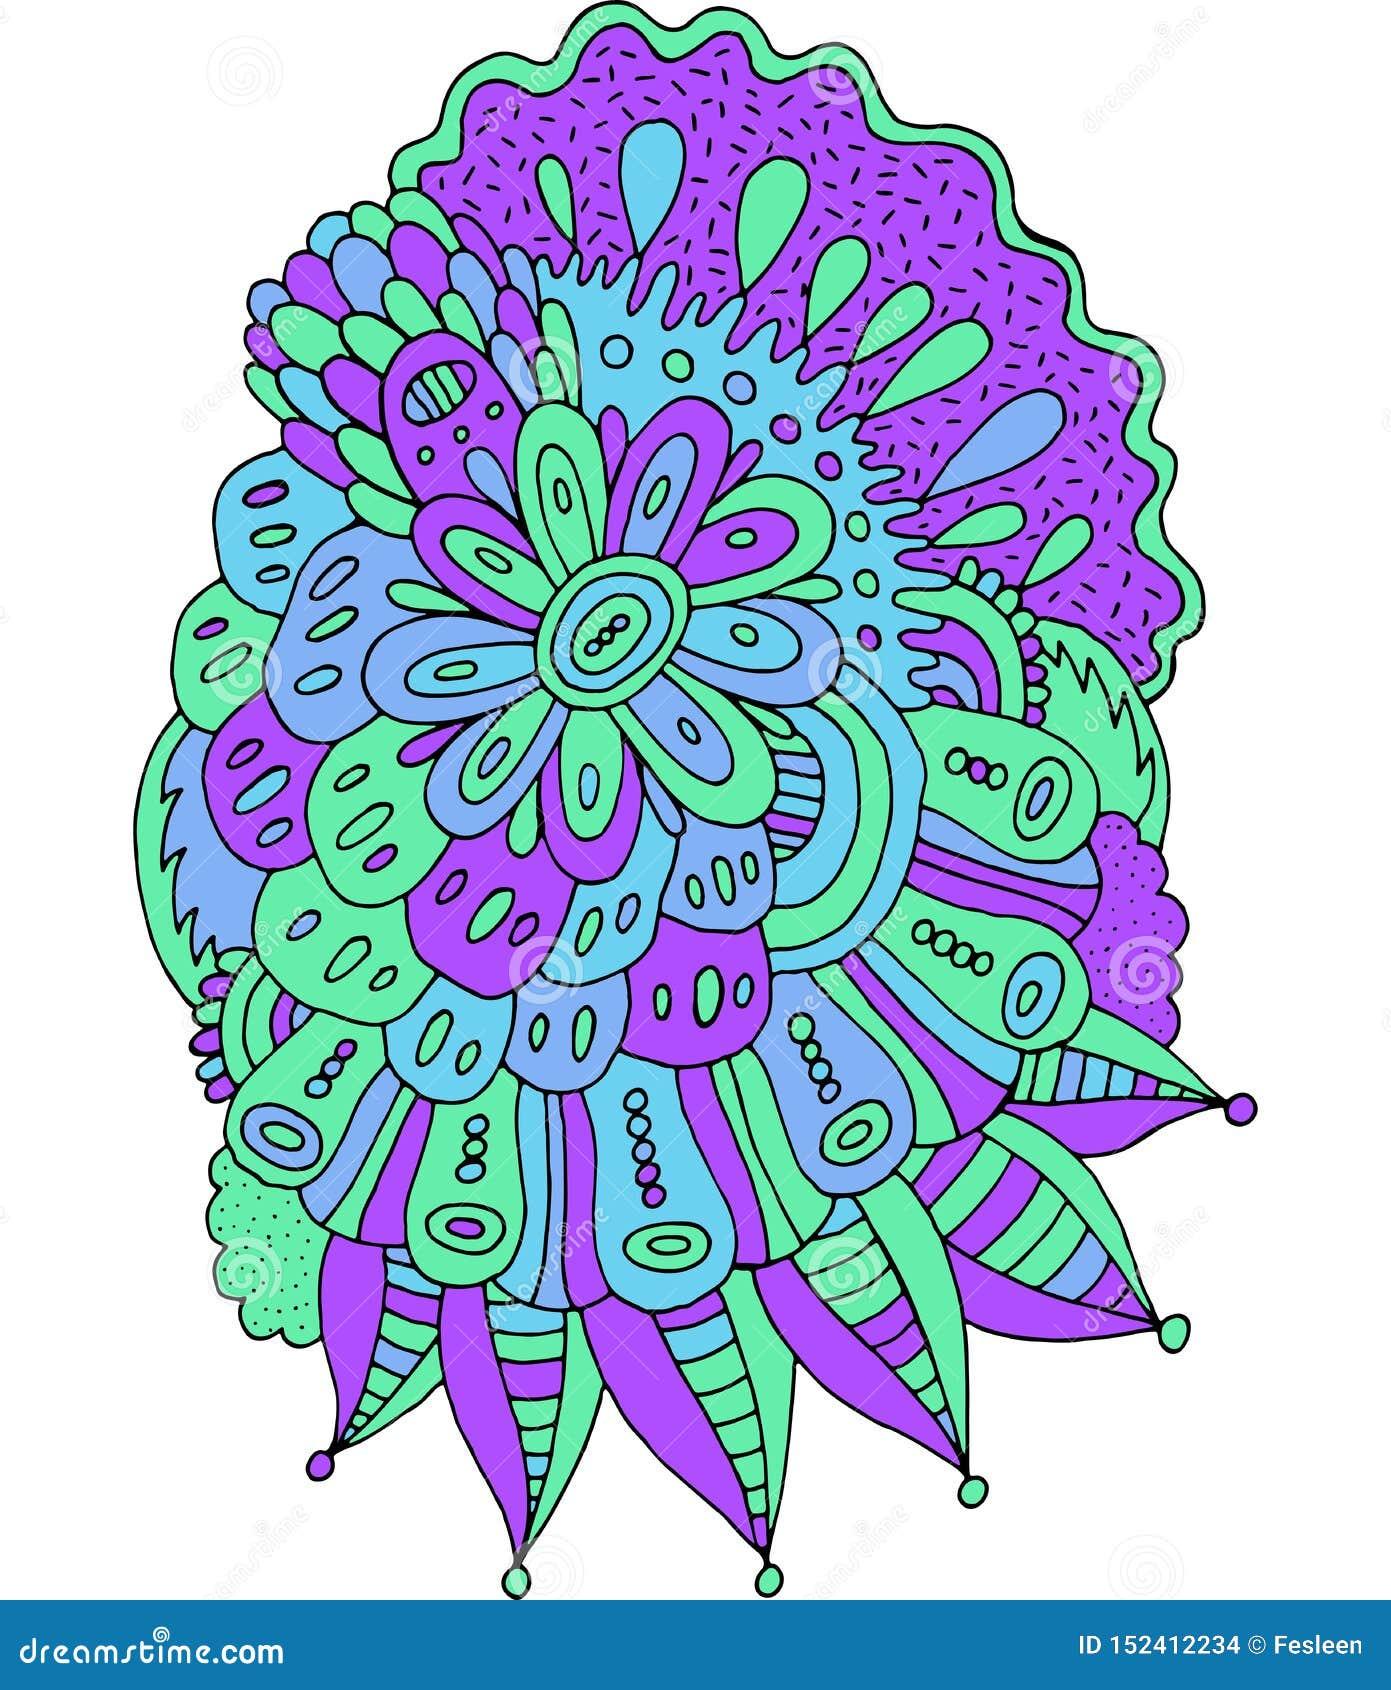 Abstract Doodle Floral Mandala Art Hand Drawn Cartoon Boho